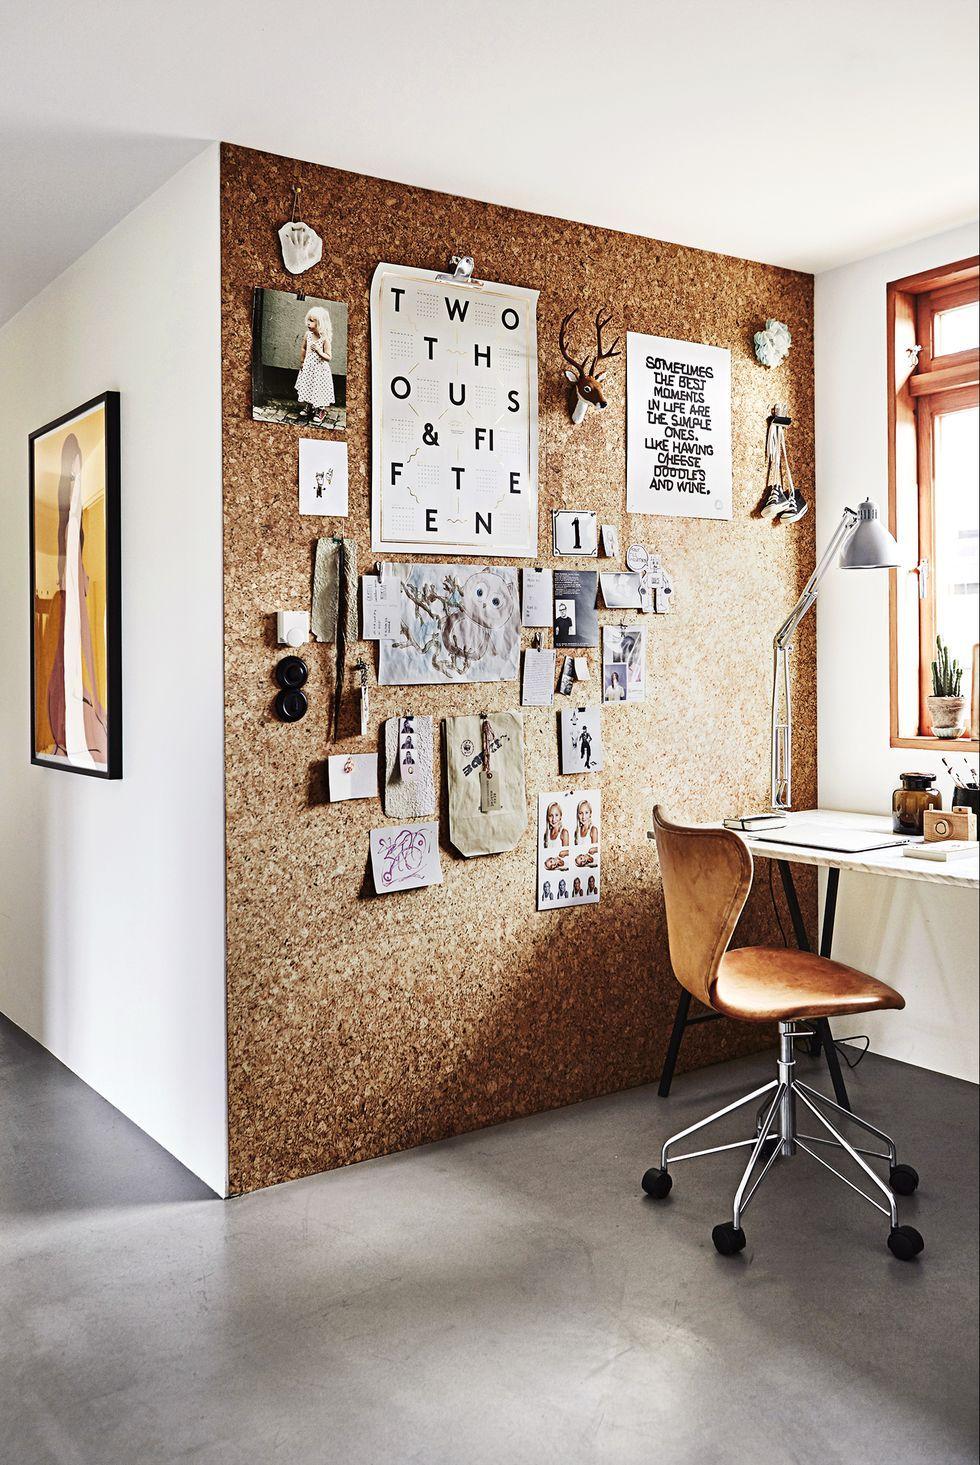 30 Modern Minimalist Home Office Ideas ...renoguide.com.au